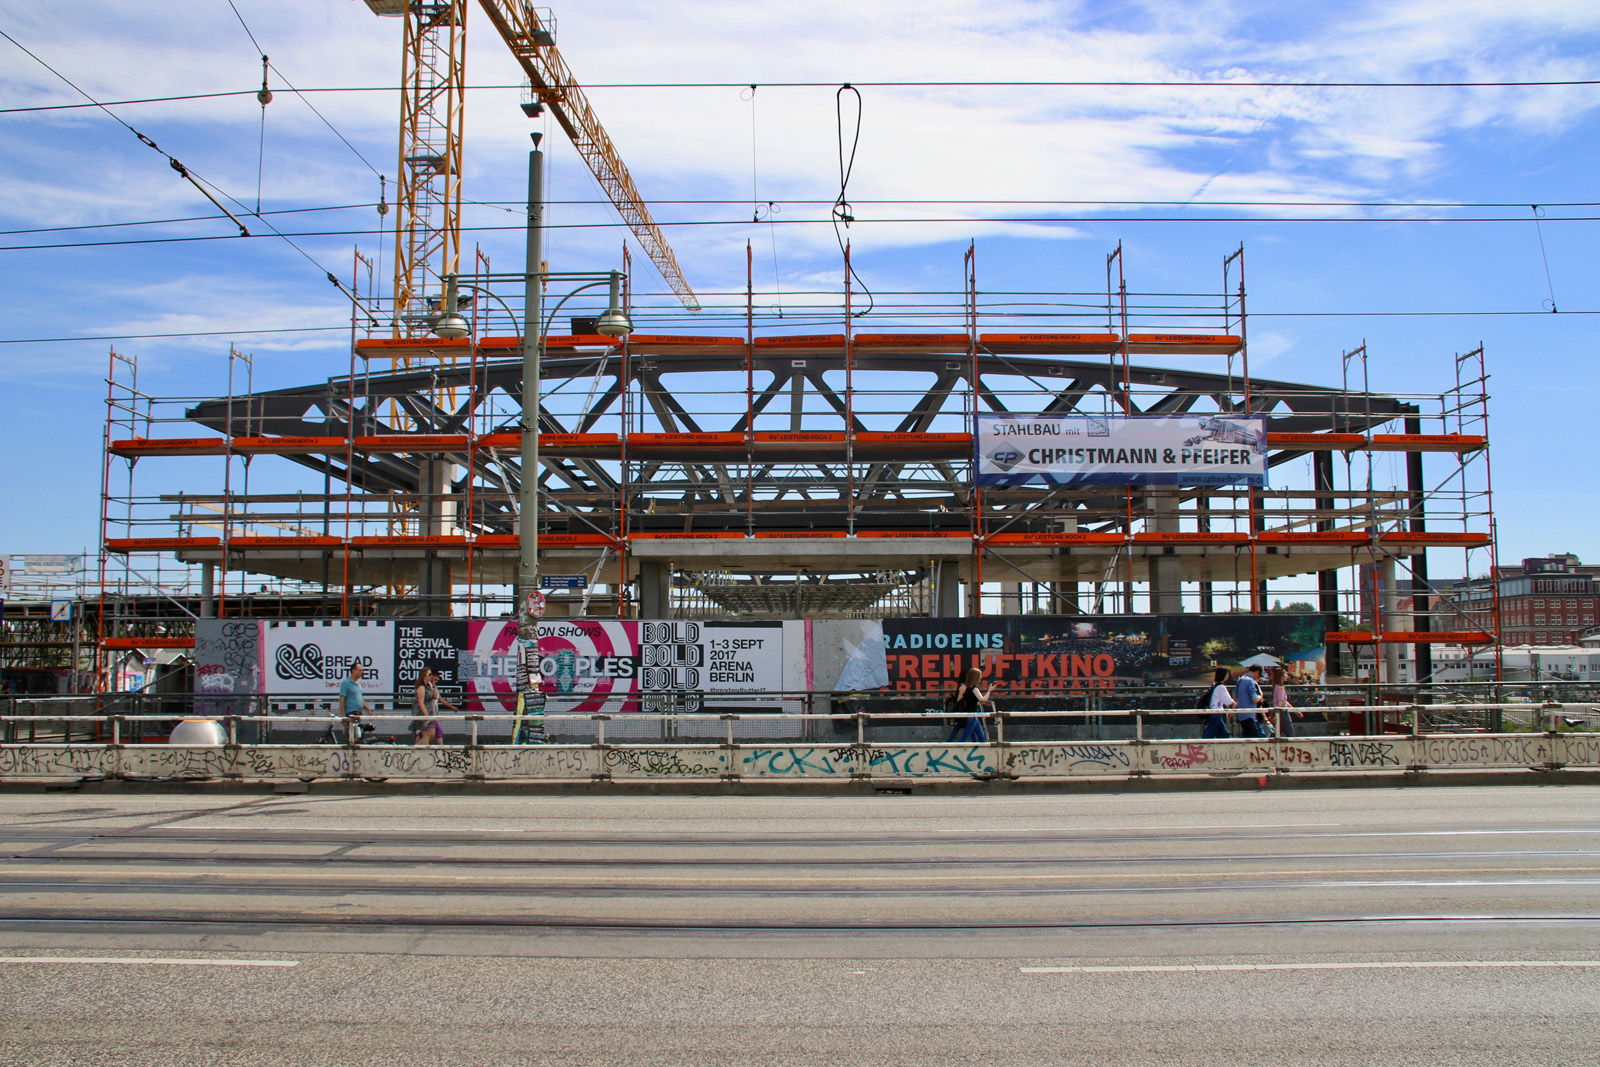 baustelle-ostkreuz-august-2017-42.jpg